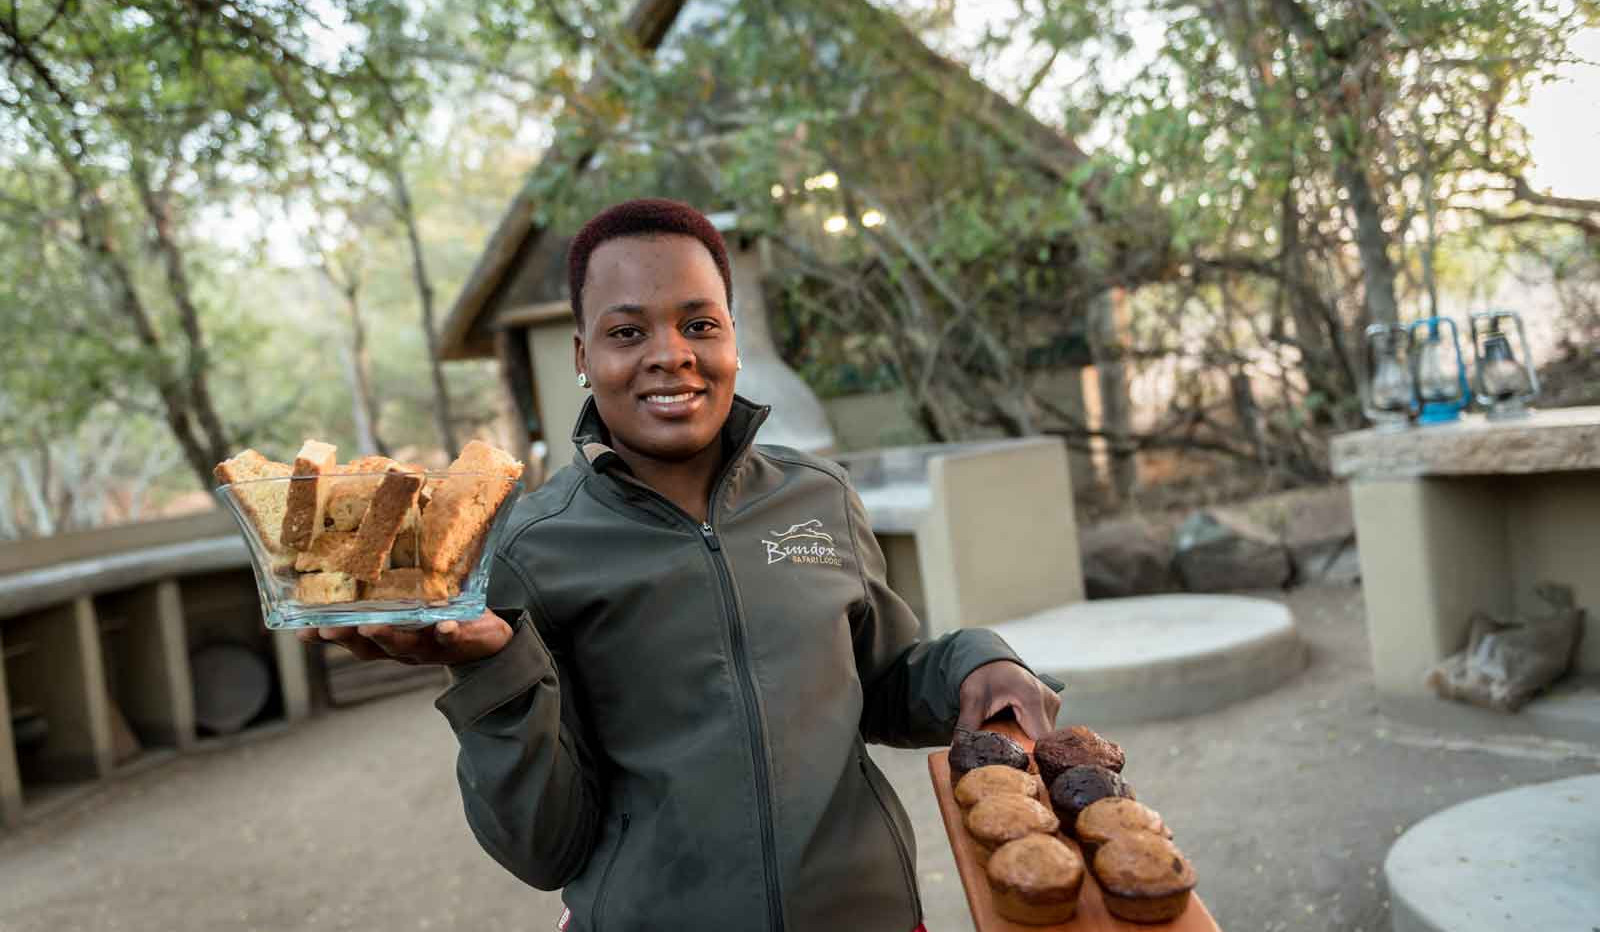 6-bundox-person-muffins.jpg